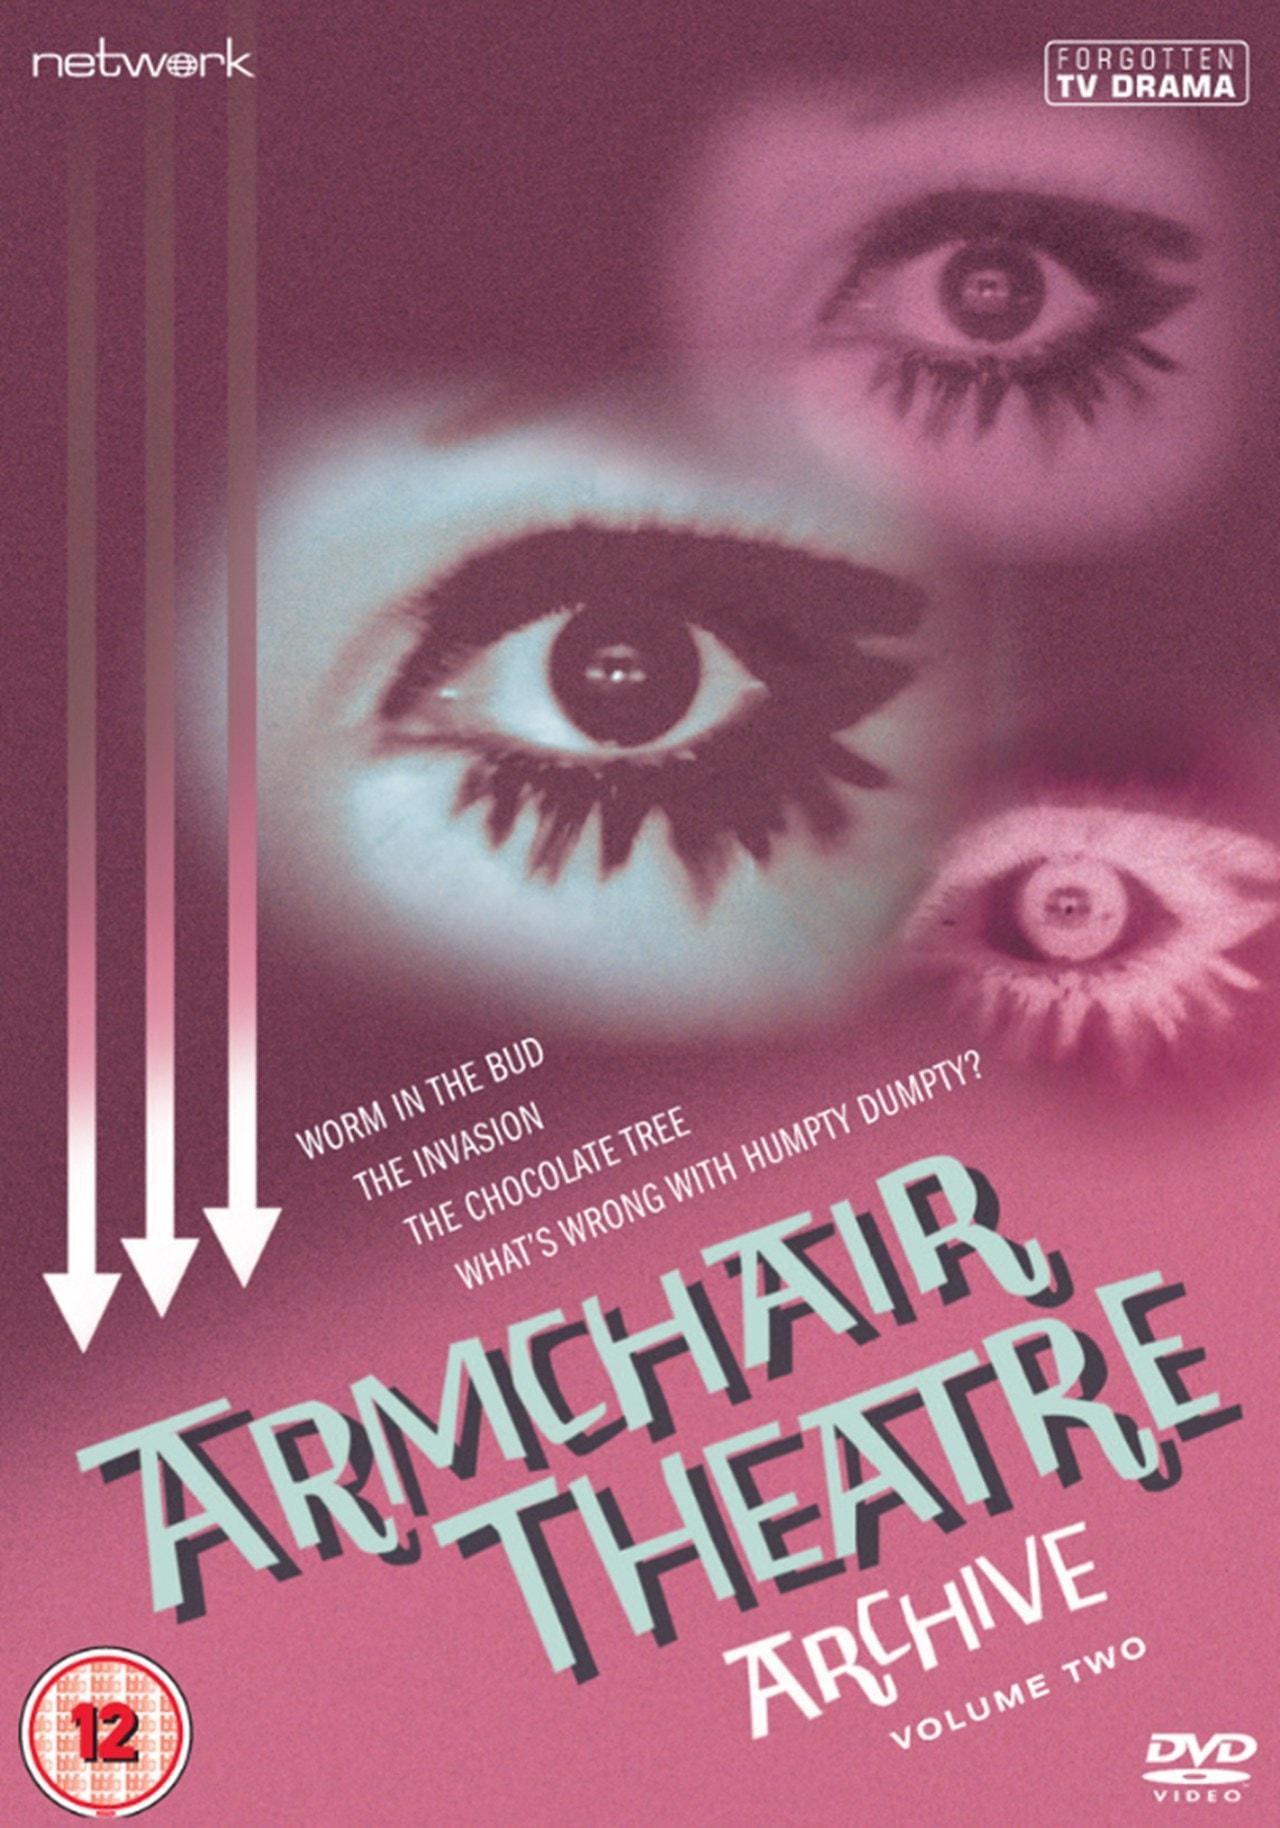 Armchair Theatre Archive: Volume 2 - 1